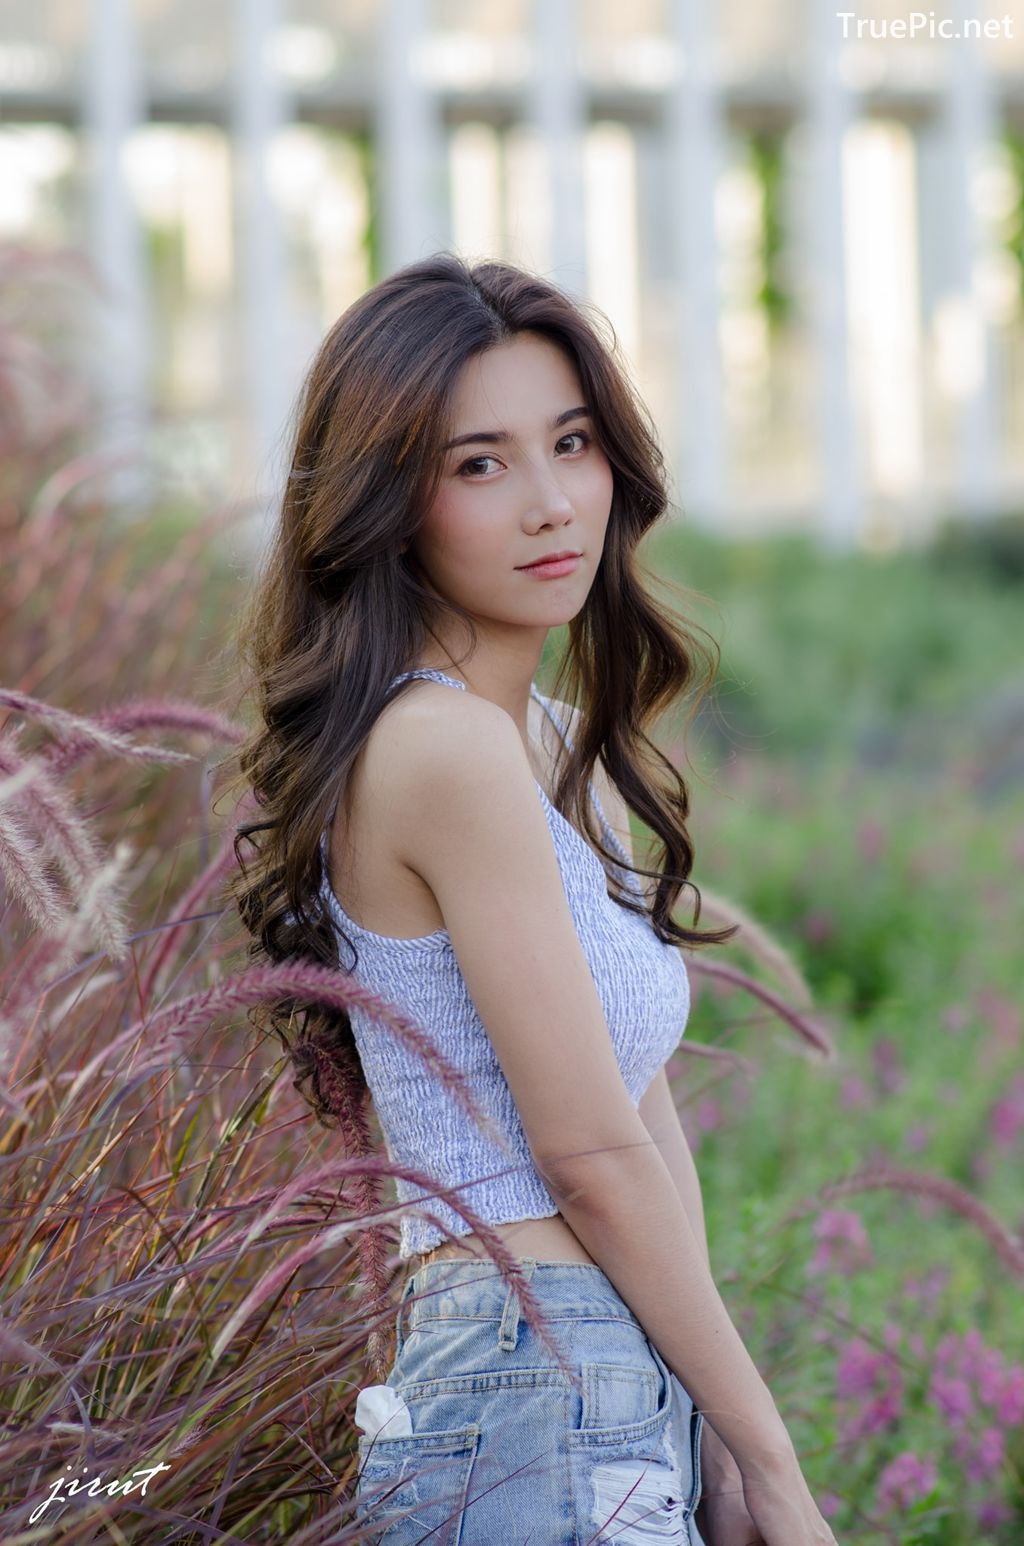 Image-Thailand-Model-Baiyok-Panachon-Cute-White-Crop-Top-and-Short-Jean-TruePic.net- Picture-1